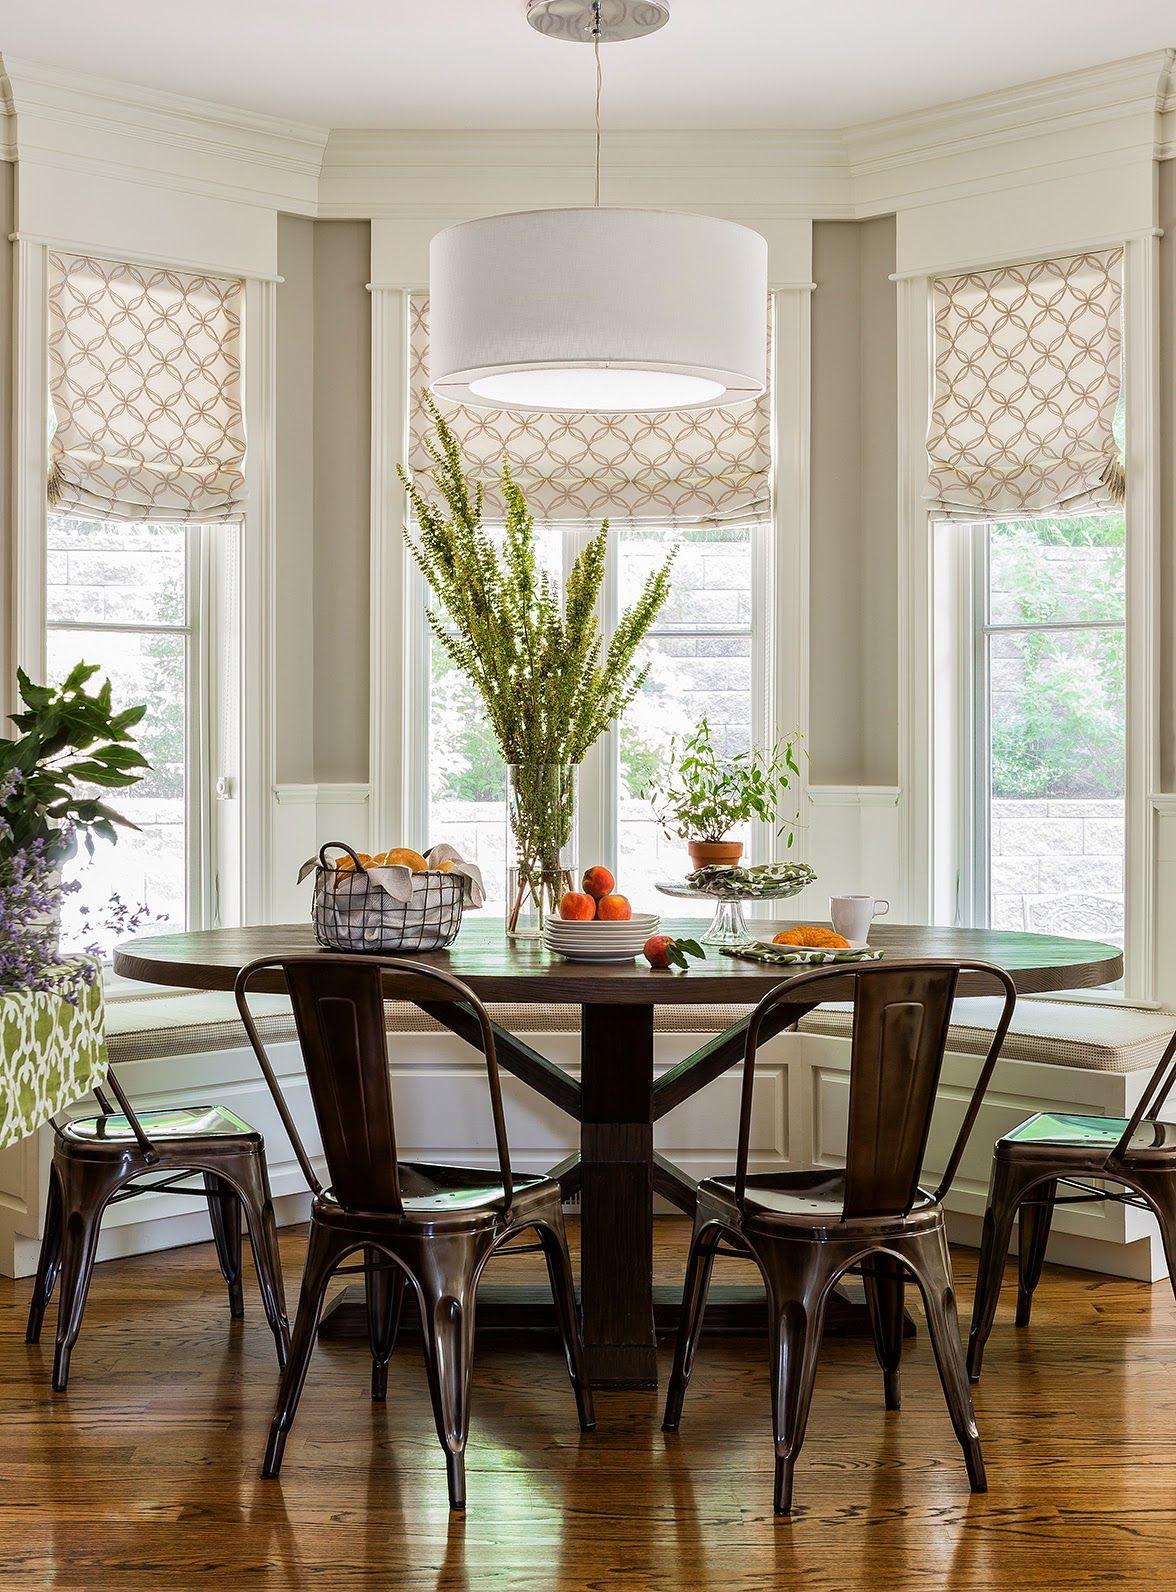 Nashville Full Service Interior Design Firm Light Fixtures